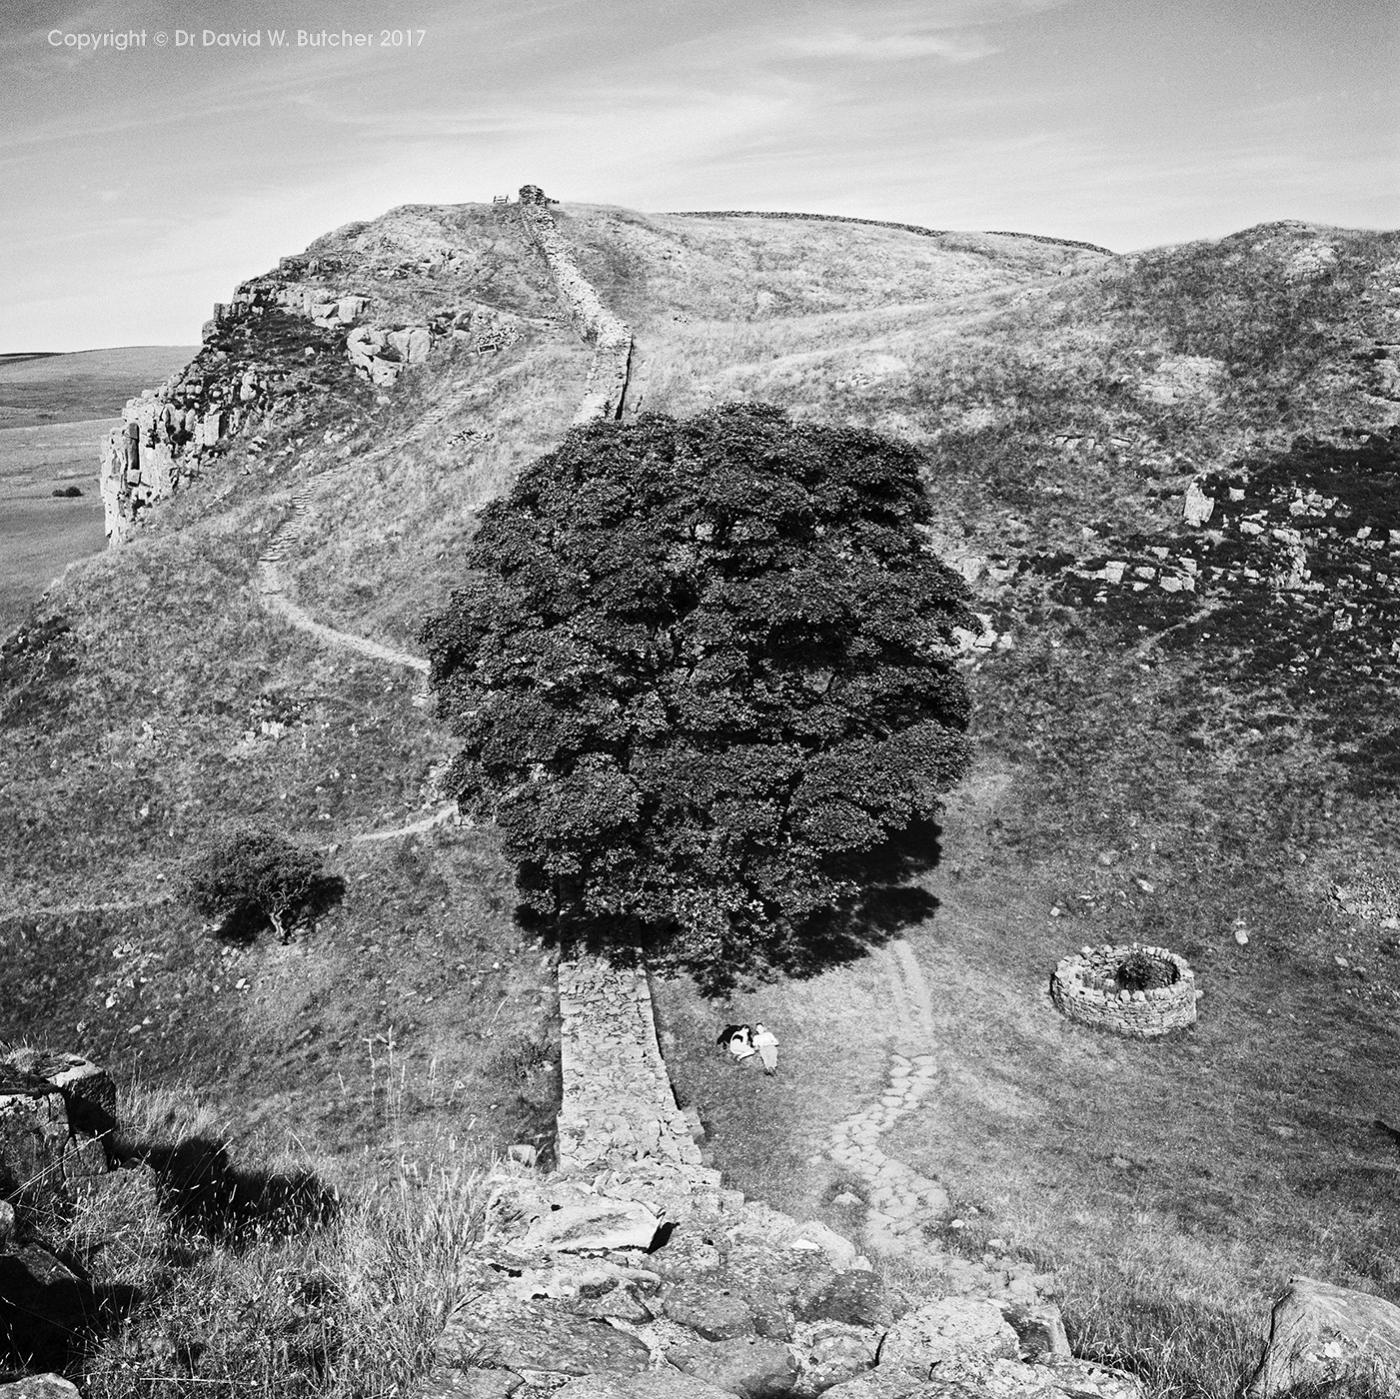 Hadrian's Wall and Sycamore Gap, Northumberland